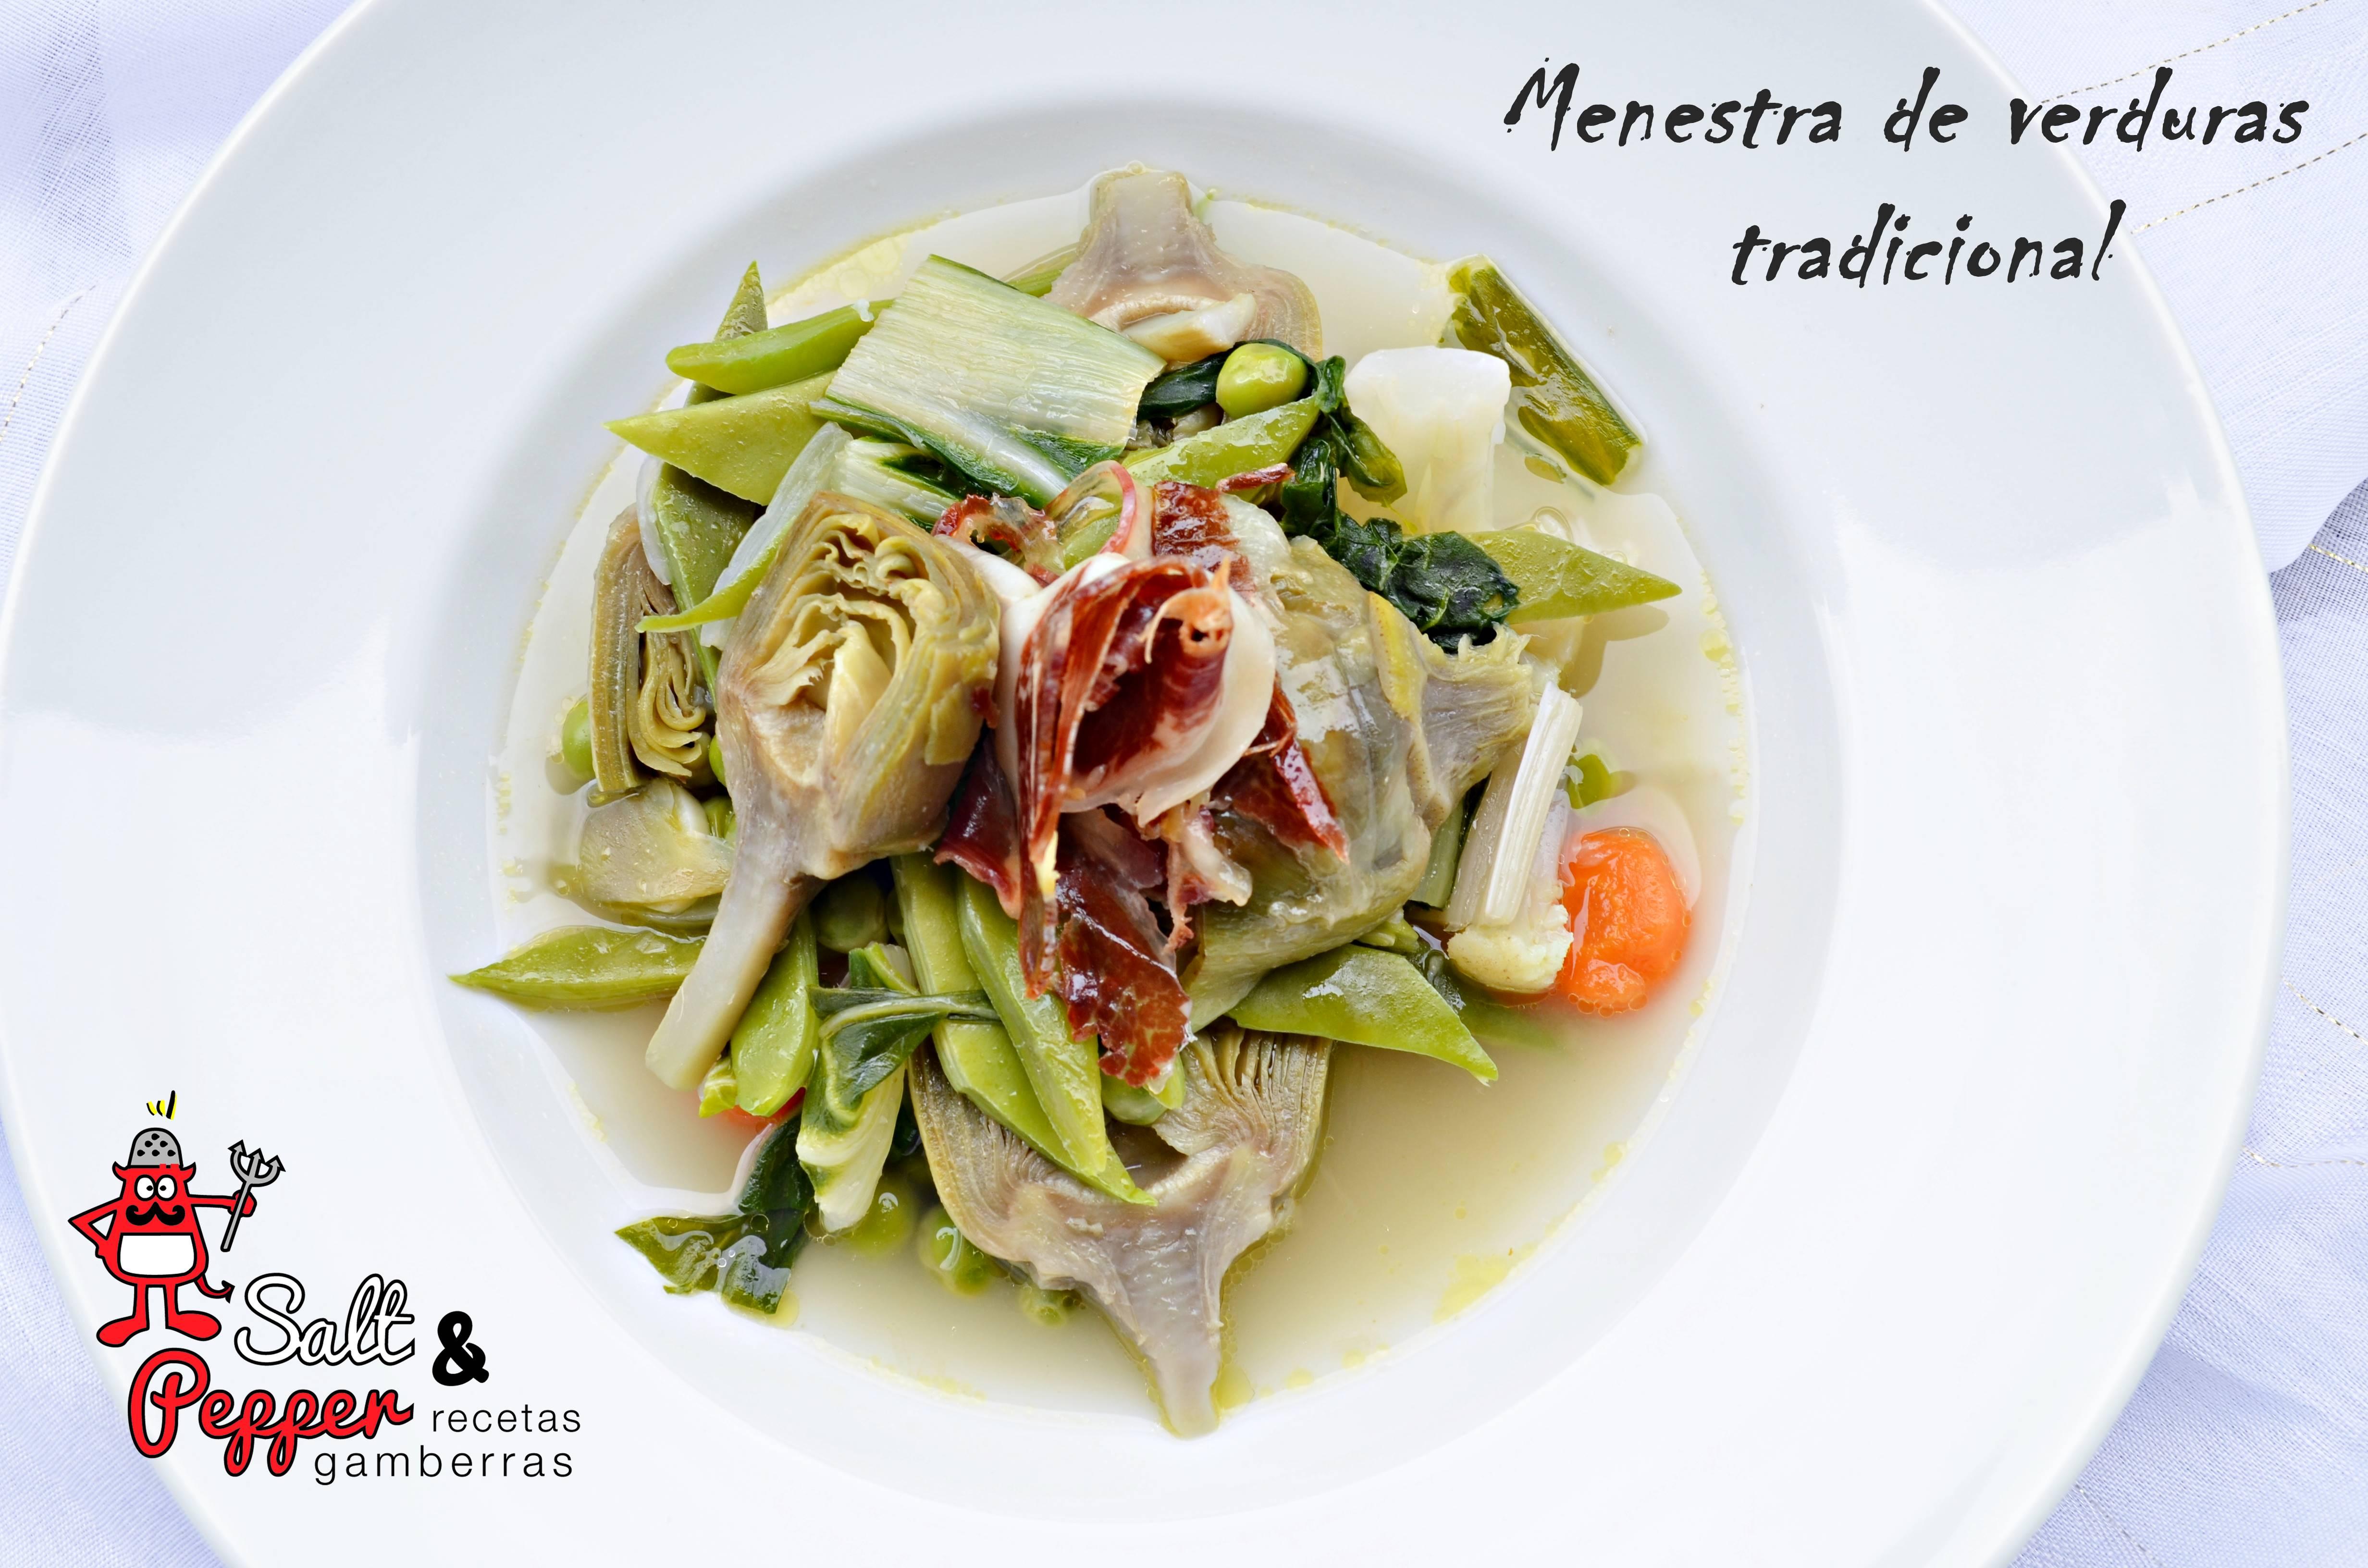 Plato de tradicional menestra de verduras navarras.